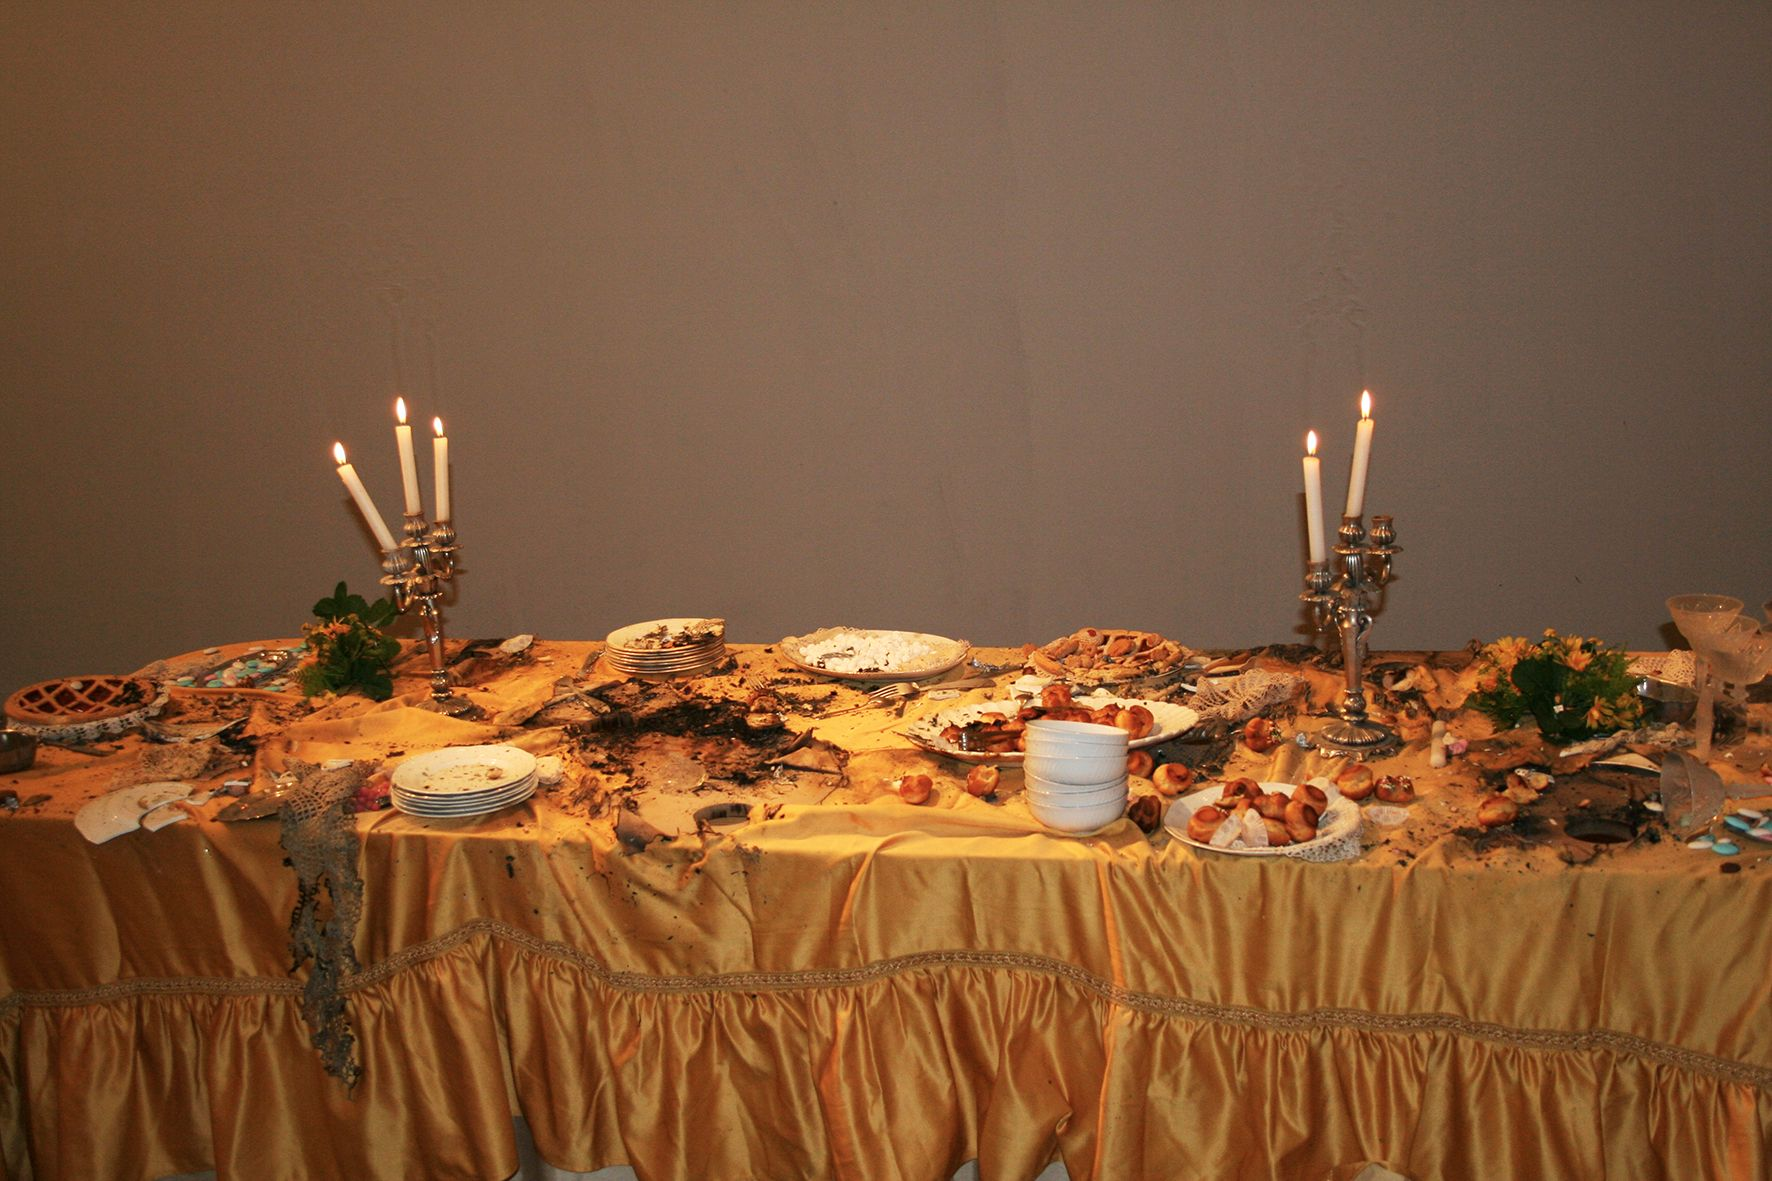 Loredana Longo, Explosion8 sweets, 2006_Courtesy Francesco Pantaleone, Palermo Milano